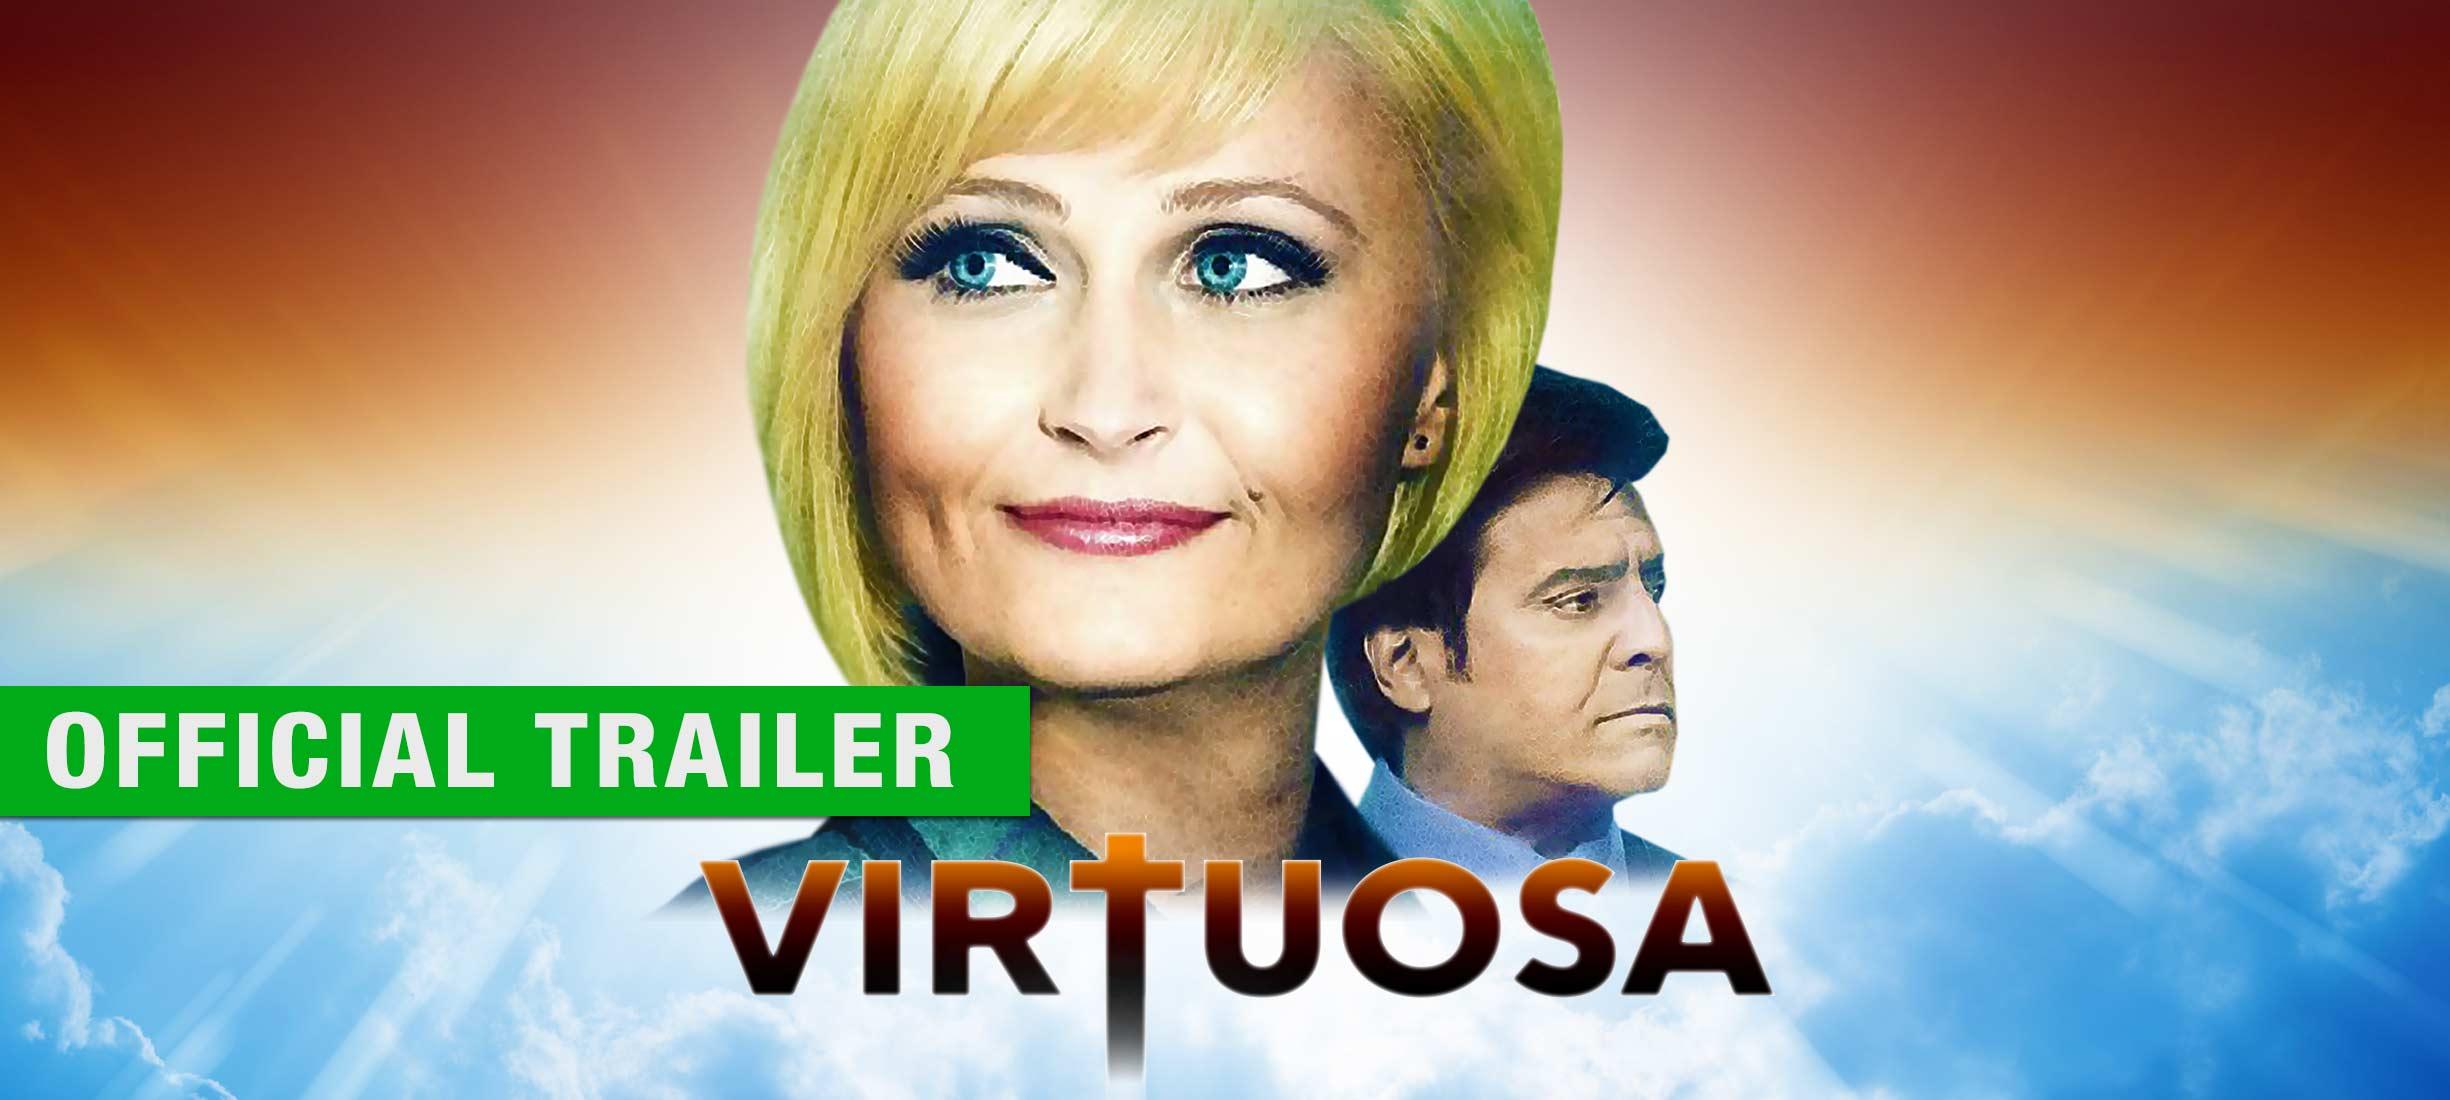 Virtuosa: Trailer